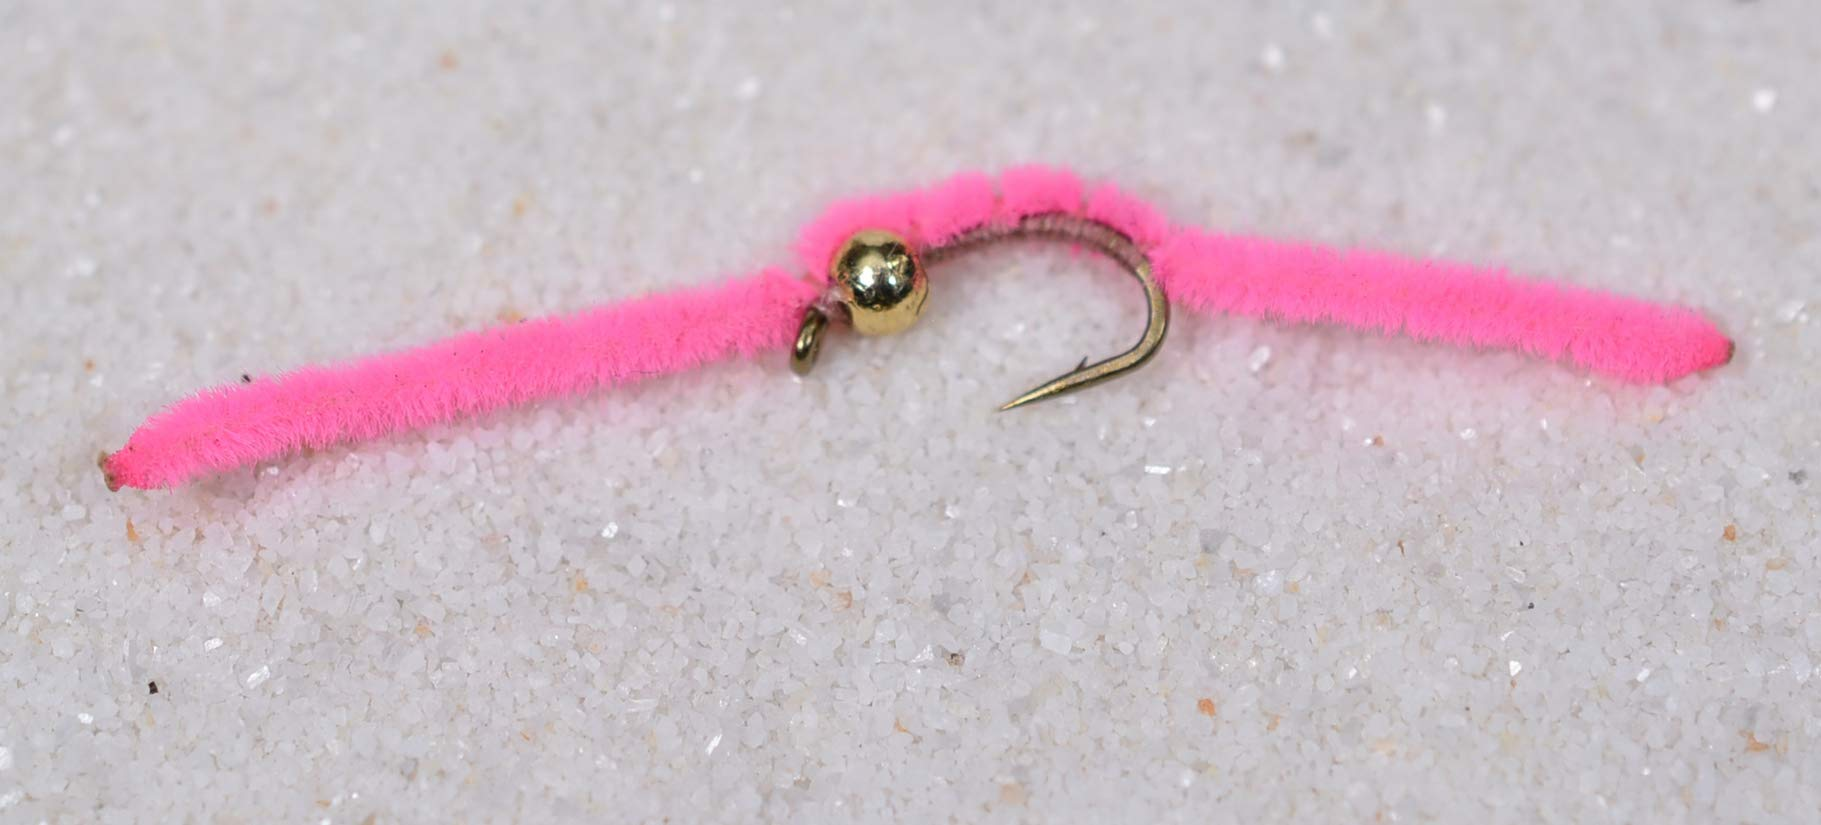 Tungsten Bead Head San Juan Worm Fishing Flies - 1 Dozen on Mustad Signature Fly Hook Size 14 - Pink by Region Fishing